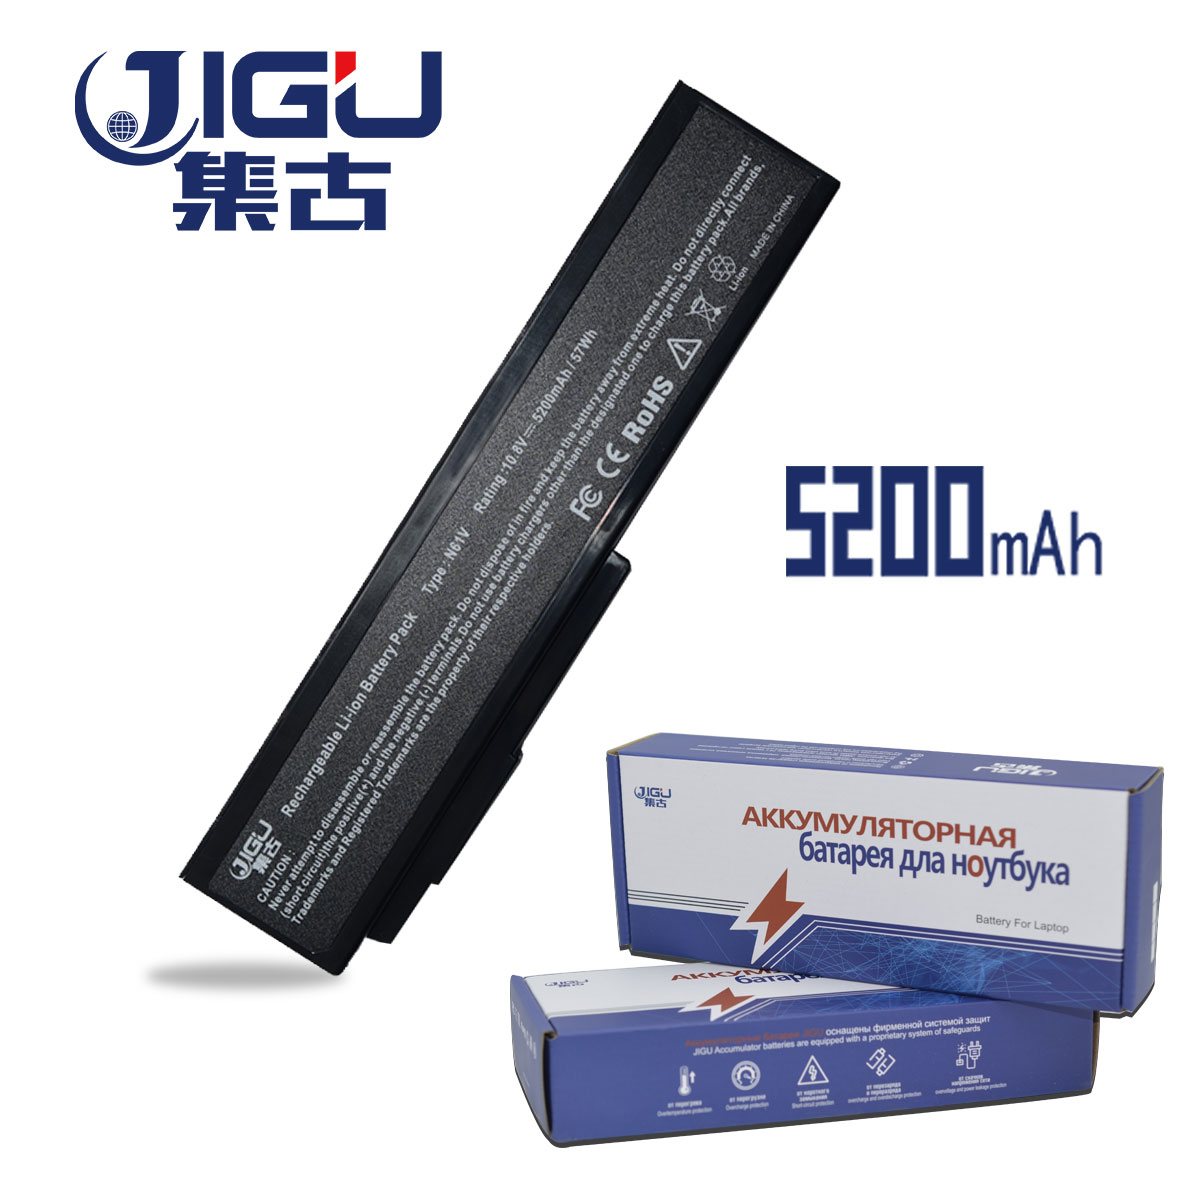 JIGU Laptop Battery For Asus N61J N61Ja N61jq N61jv N61 N61D N53T N53J N53S M50 A32-N61 A32-M50 A33-M50 jigu laptop battery for asus n61j n61ja n61jq n61jv n61 n61d n53t n53j n53s m50 a32 n61 a32 m50 a33 m50